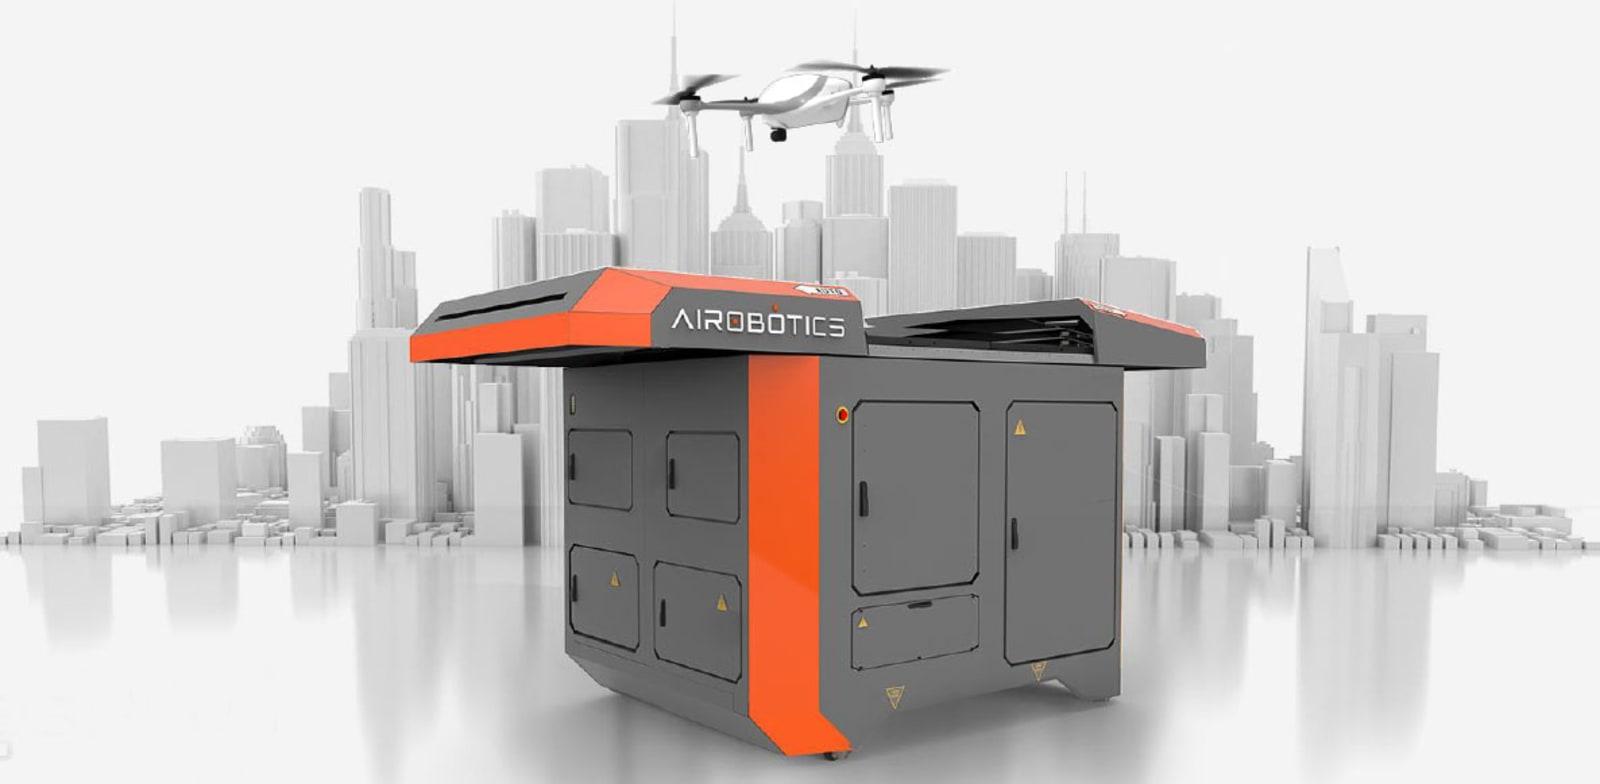 Airobotics system  credit: Company presentation